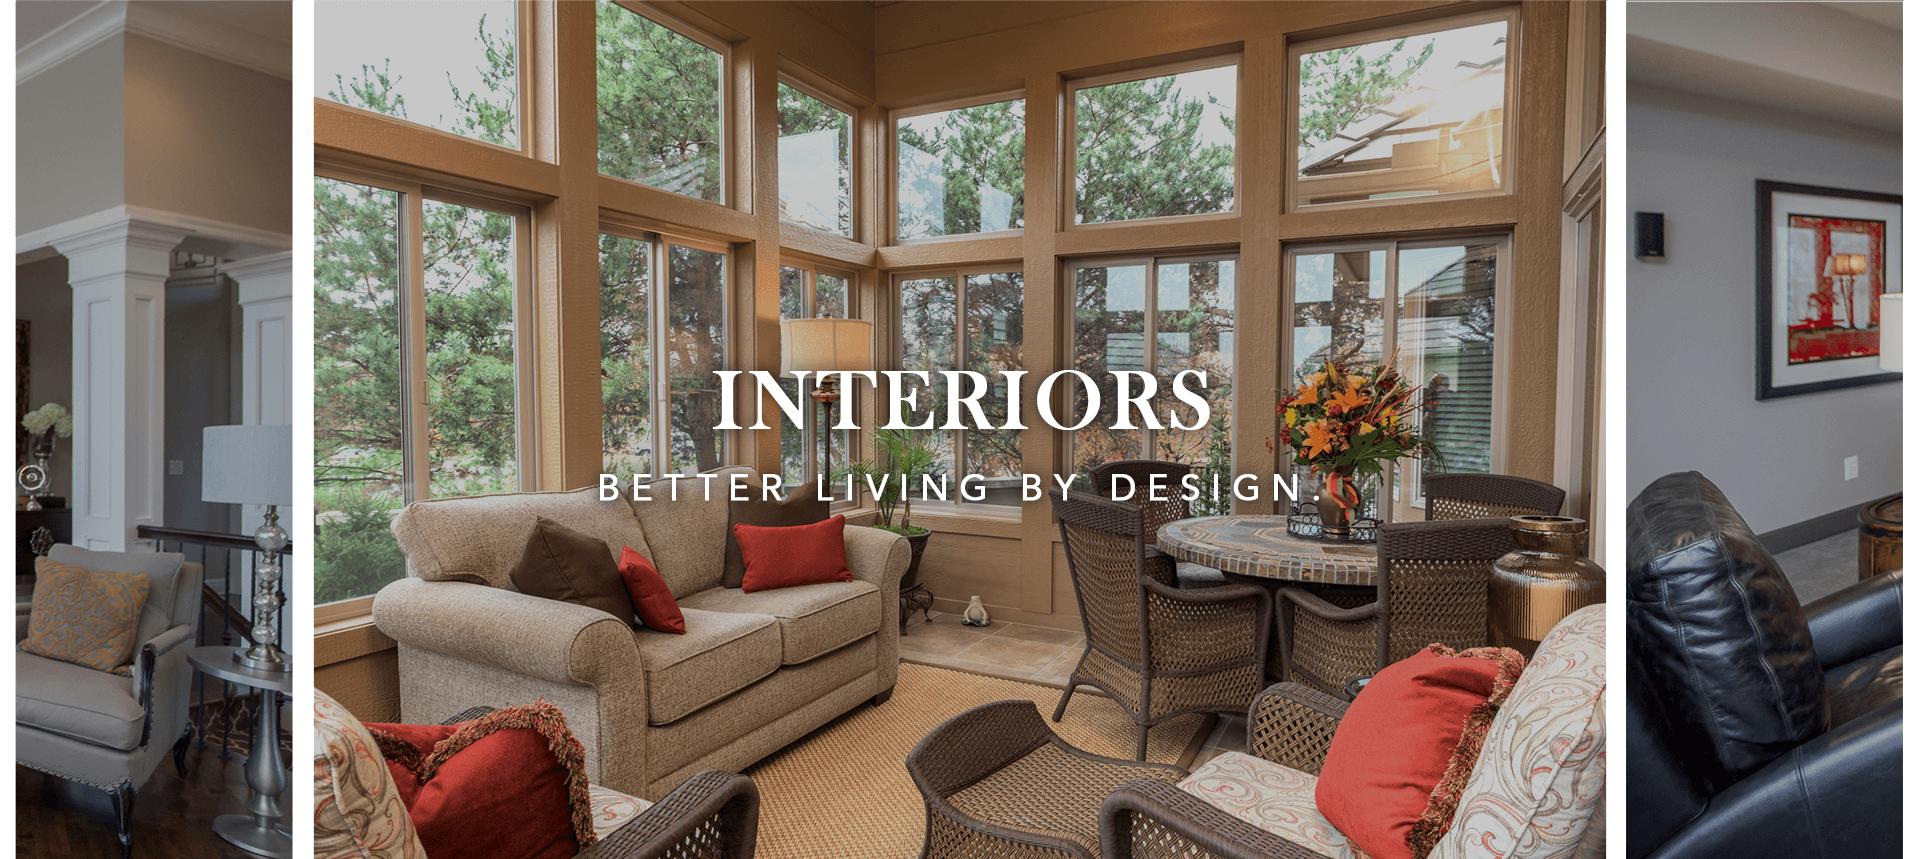 Interior Designer Overland Park, Kansas City | R. Designs, LLC